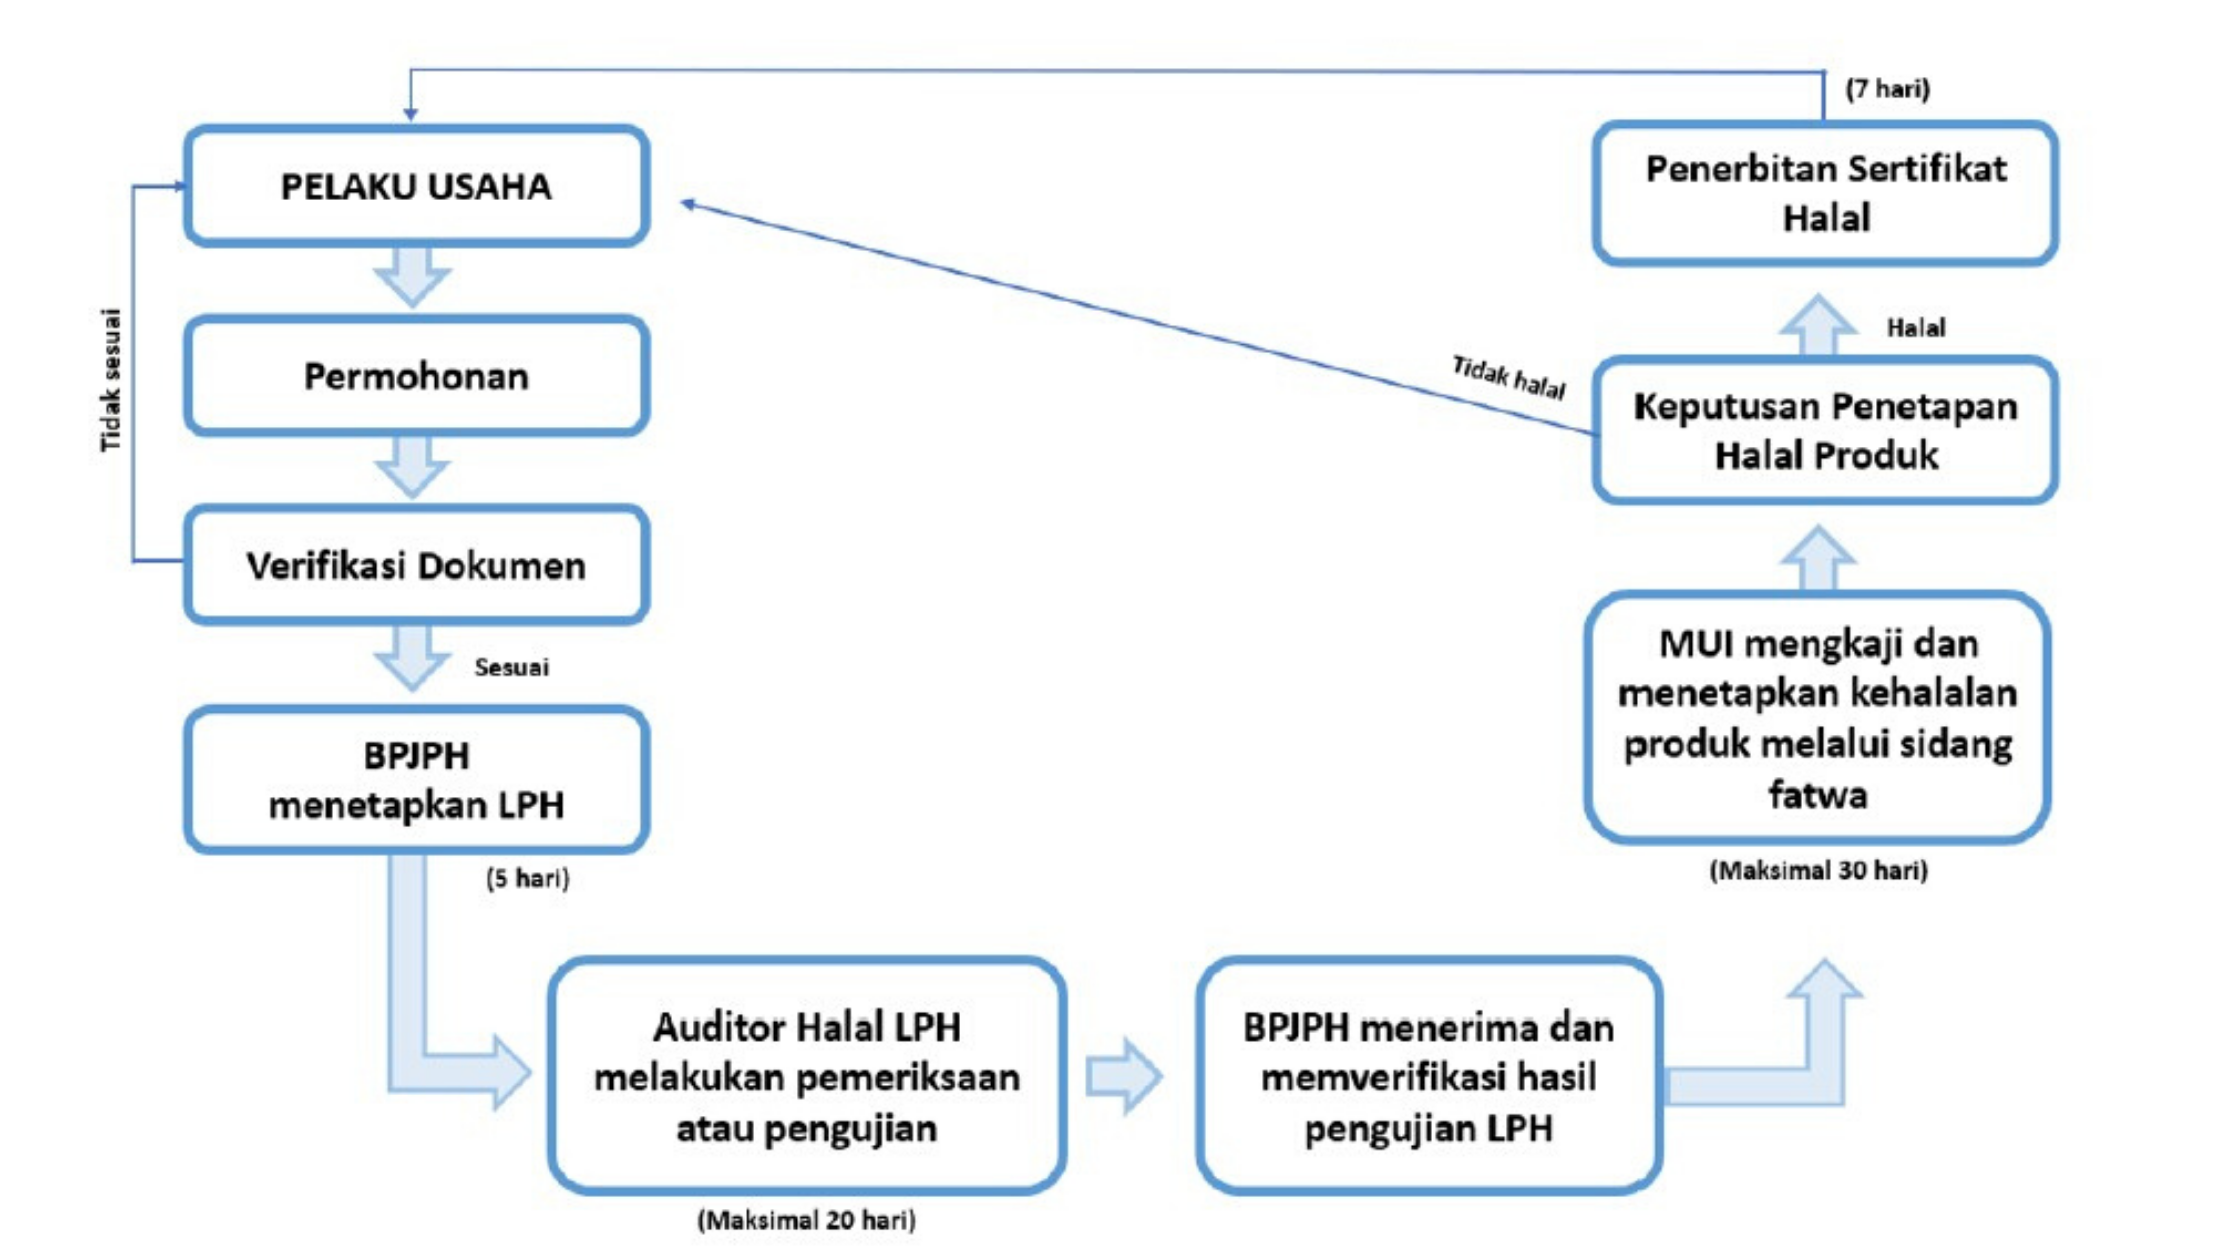 Cara Mendapatkan Label Halal BPJPH